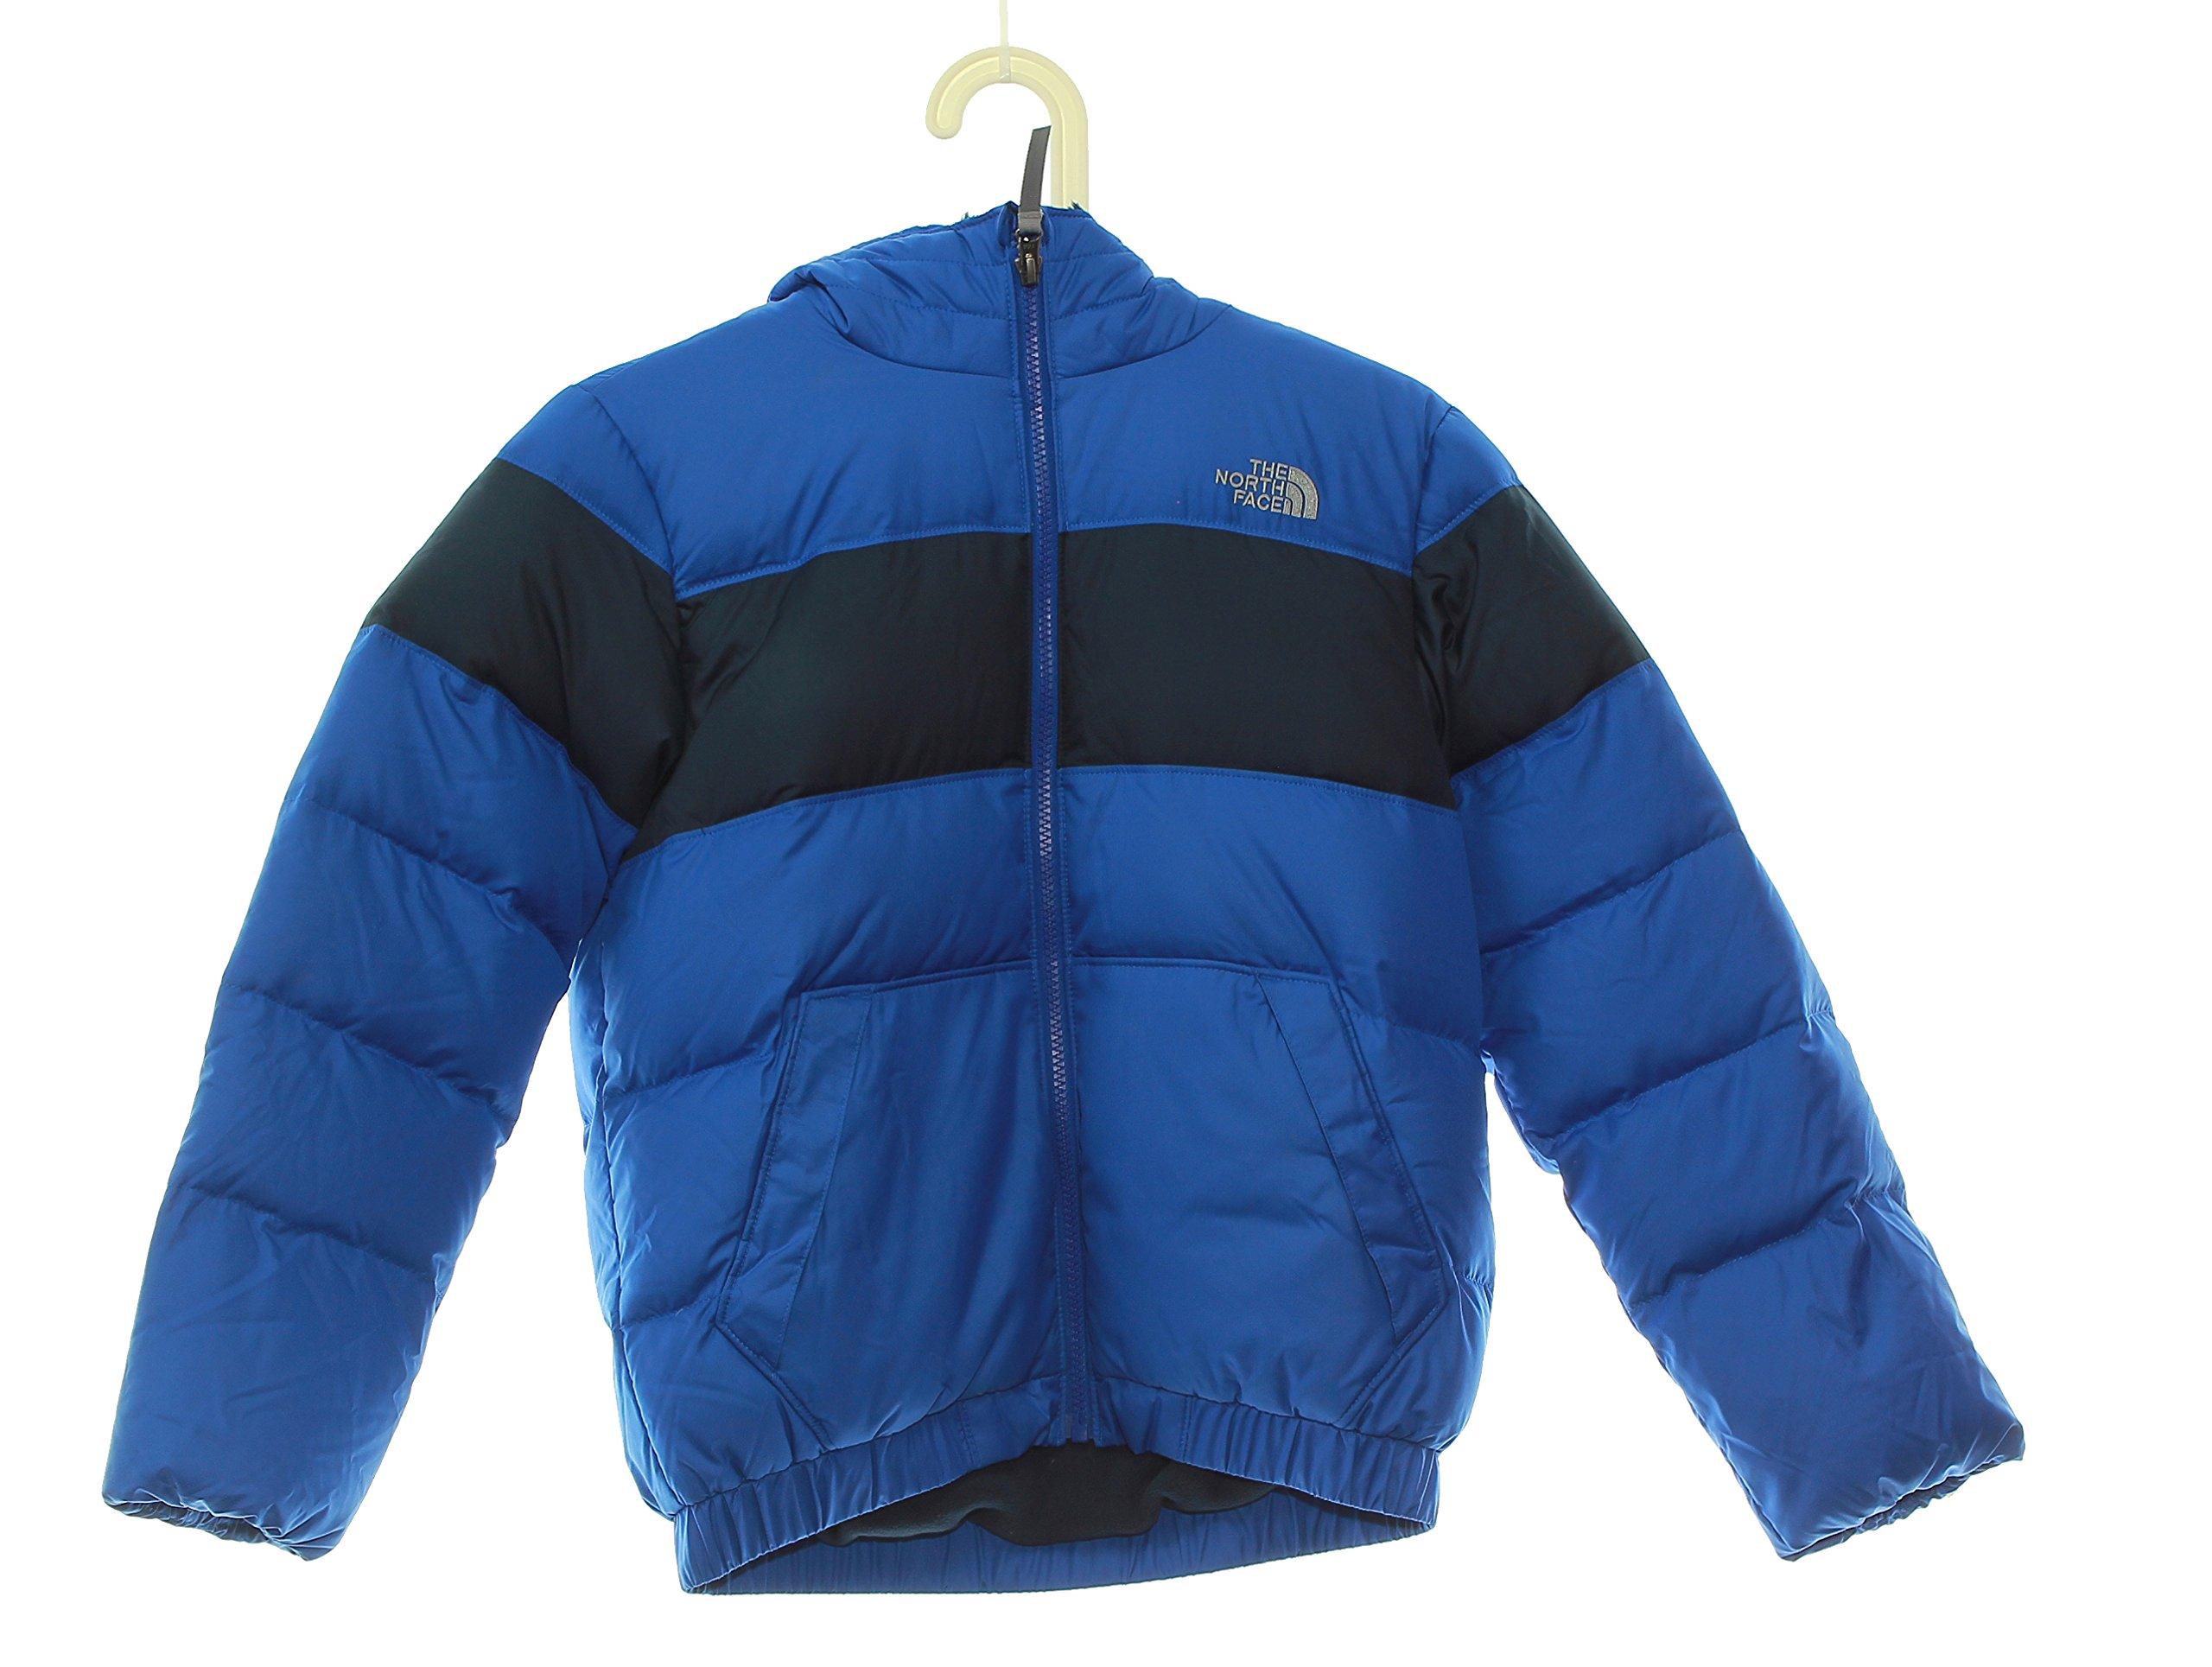 Boy's The North Face Moondoggy 2.0 Down Jacket Size 10/12 Medium Blue